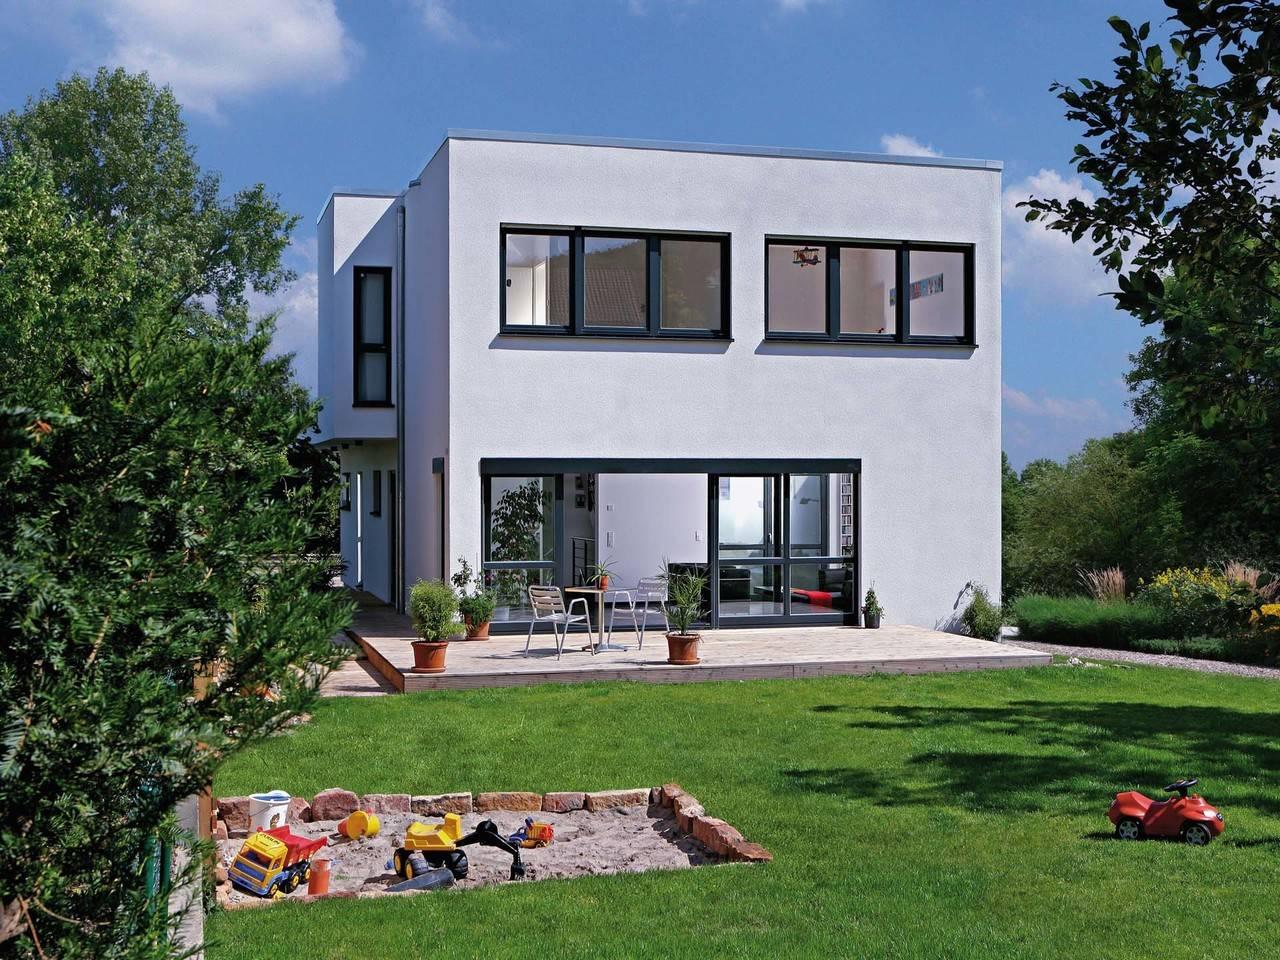 Haus Rauch Fertighaus Weiss Gartenansicht